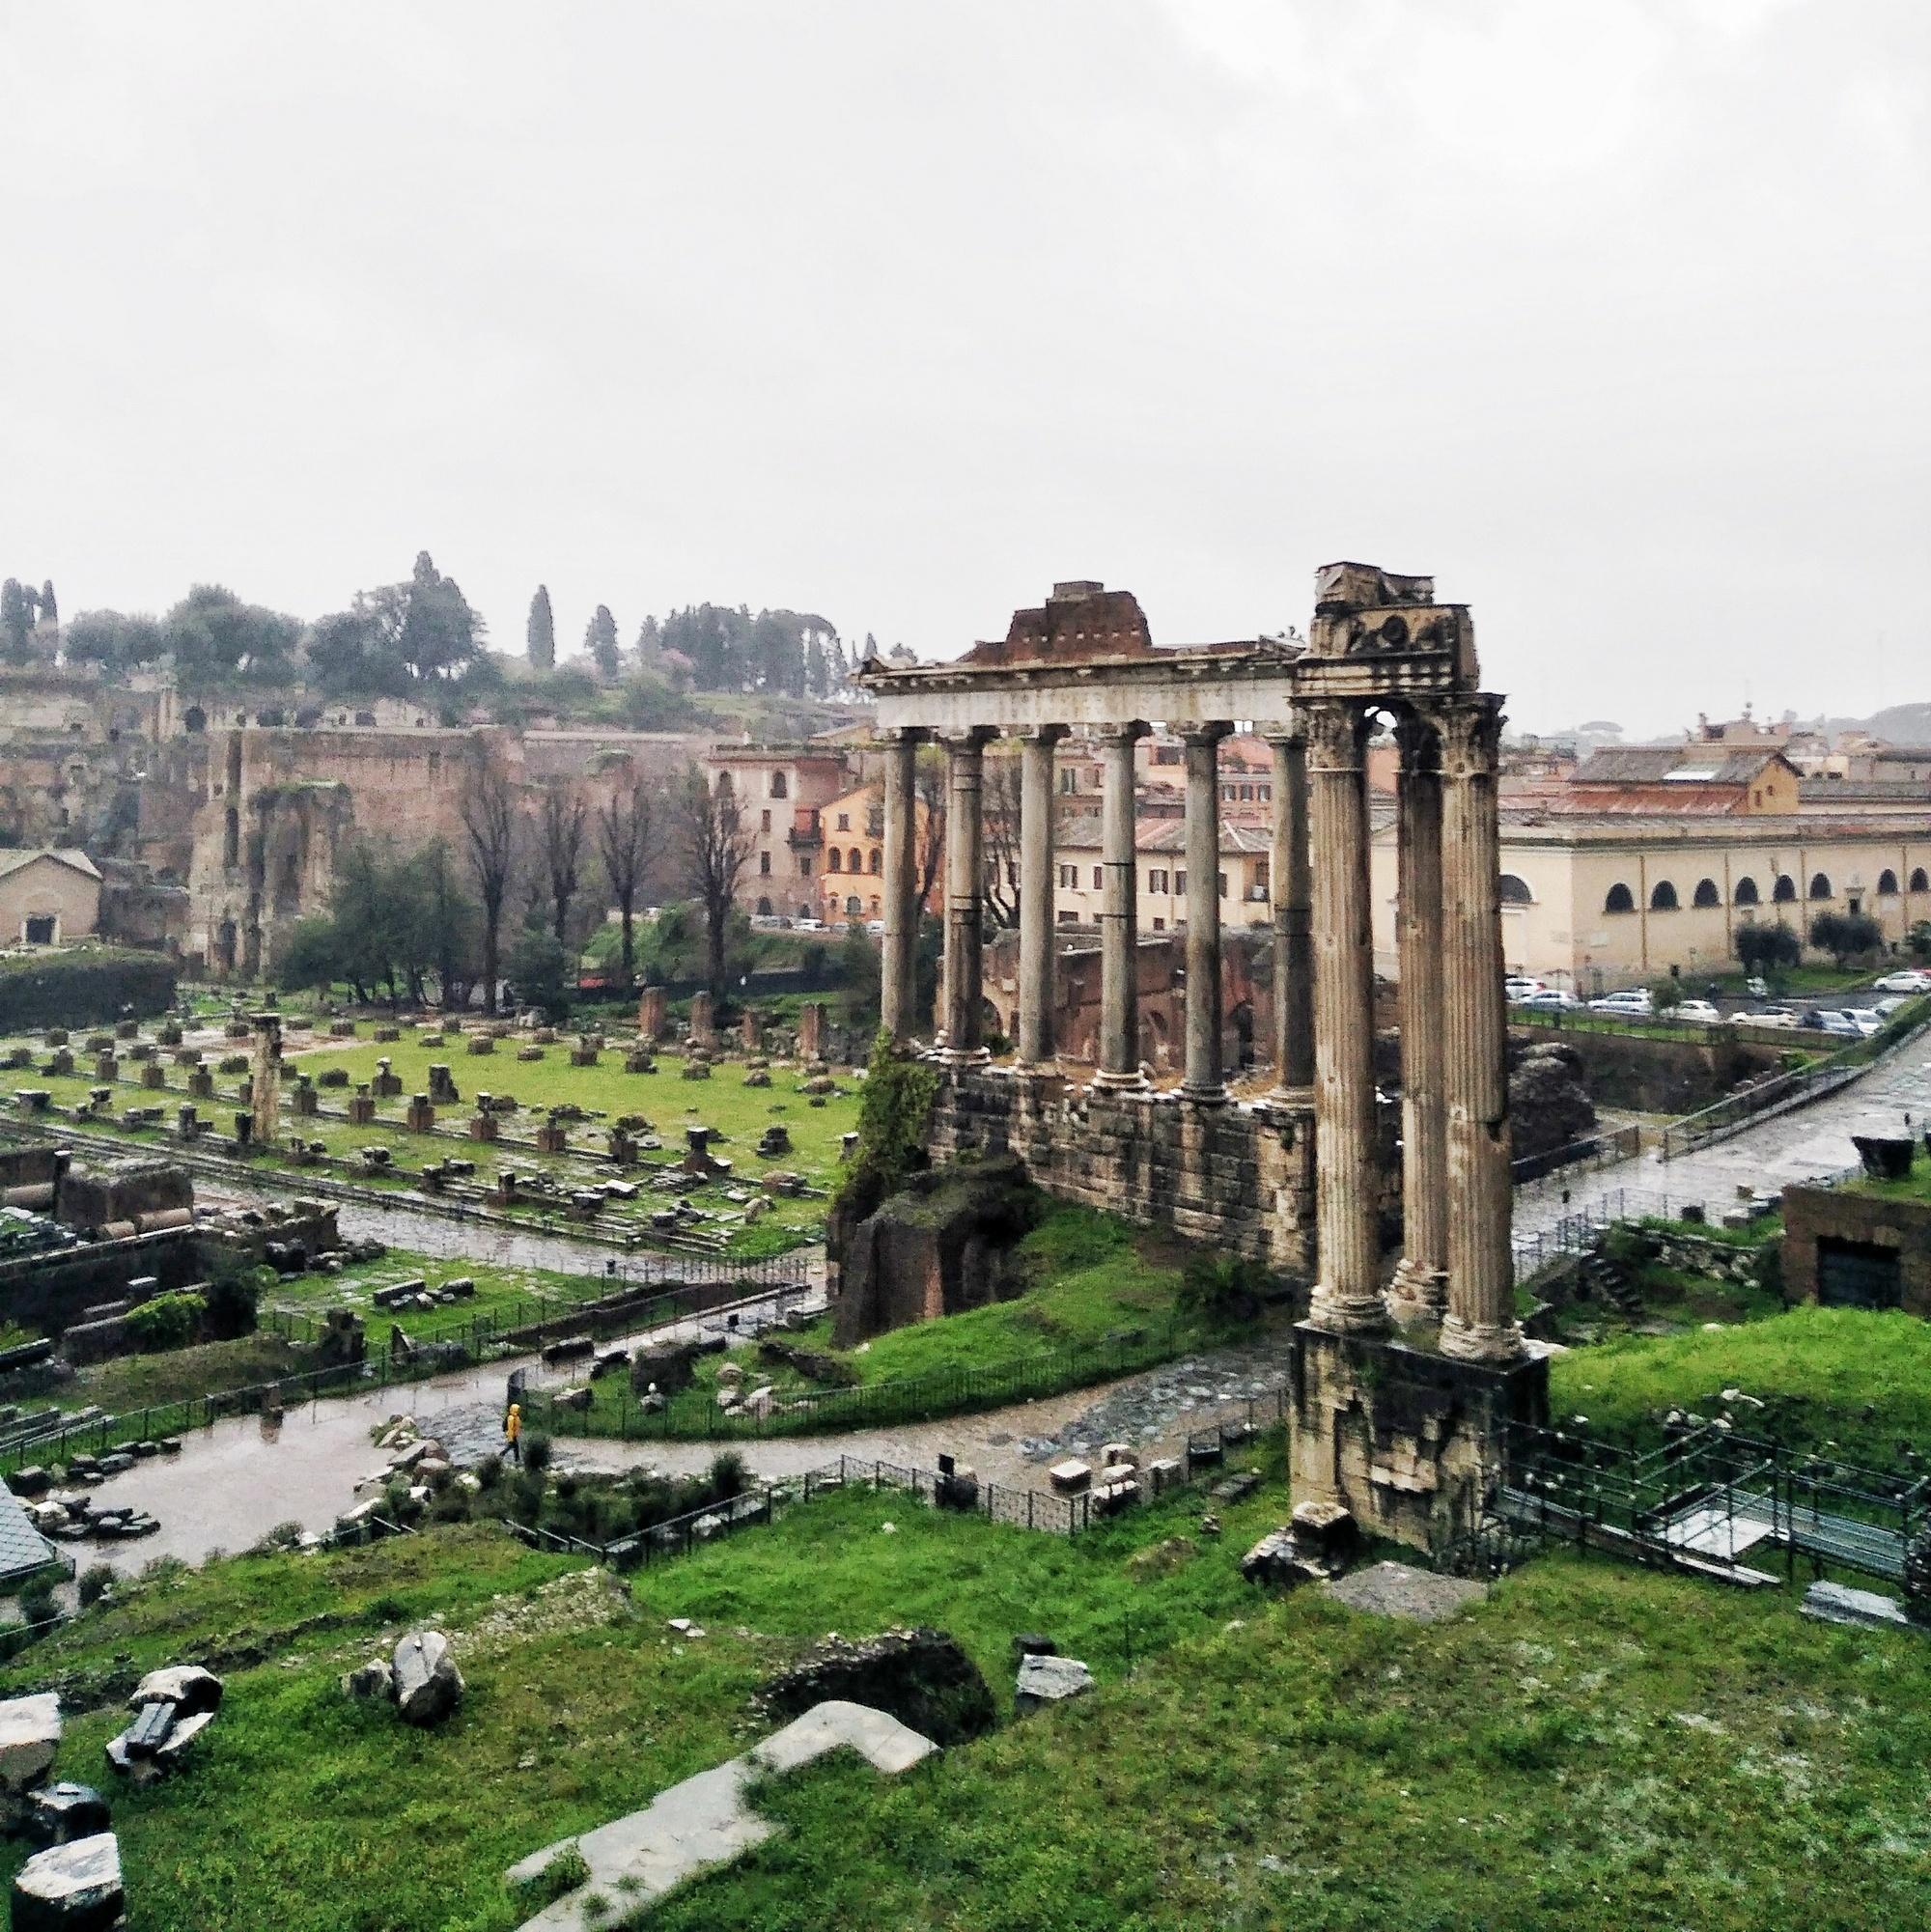 Рим: взгляд на Вечный город под другим углом Рим: взгляд на Вечный город под другим углом IMG 20180409 153203 011